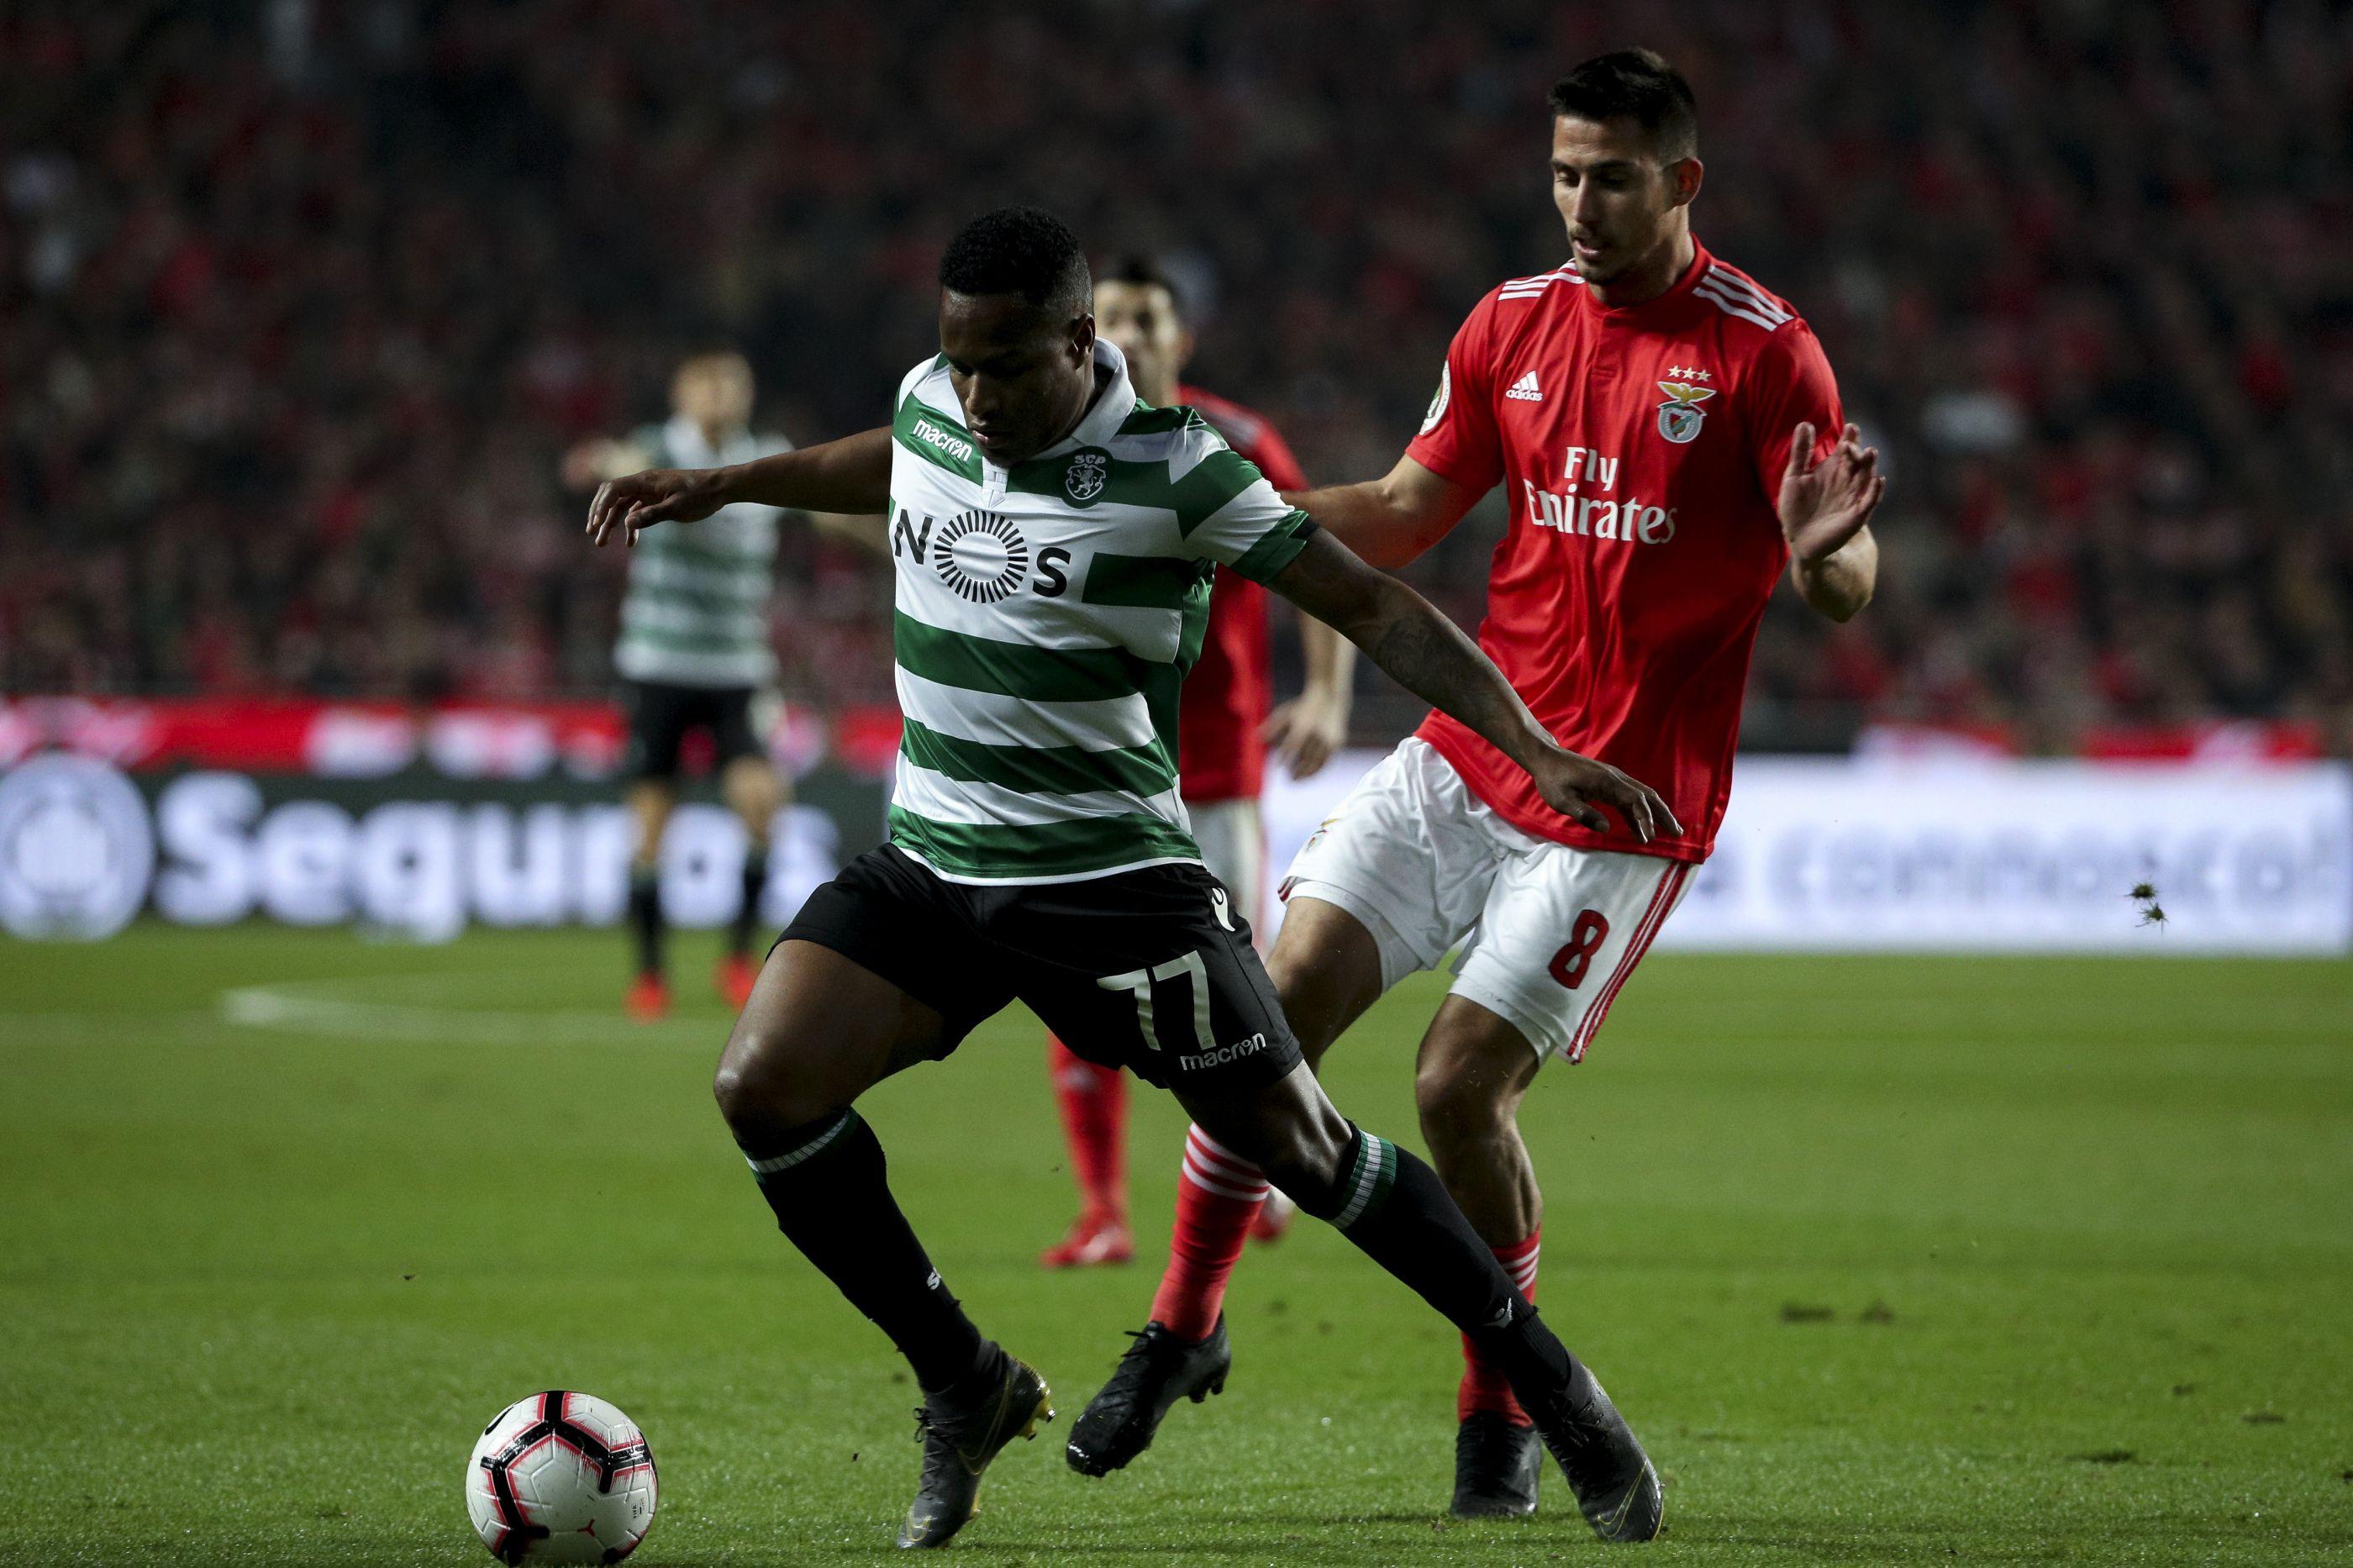 Sporting-Benfica: Jonas no banco. Bruno Gaspar regressa